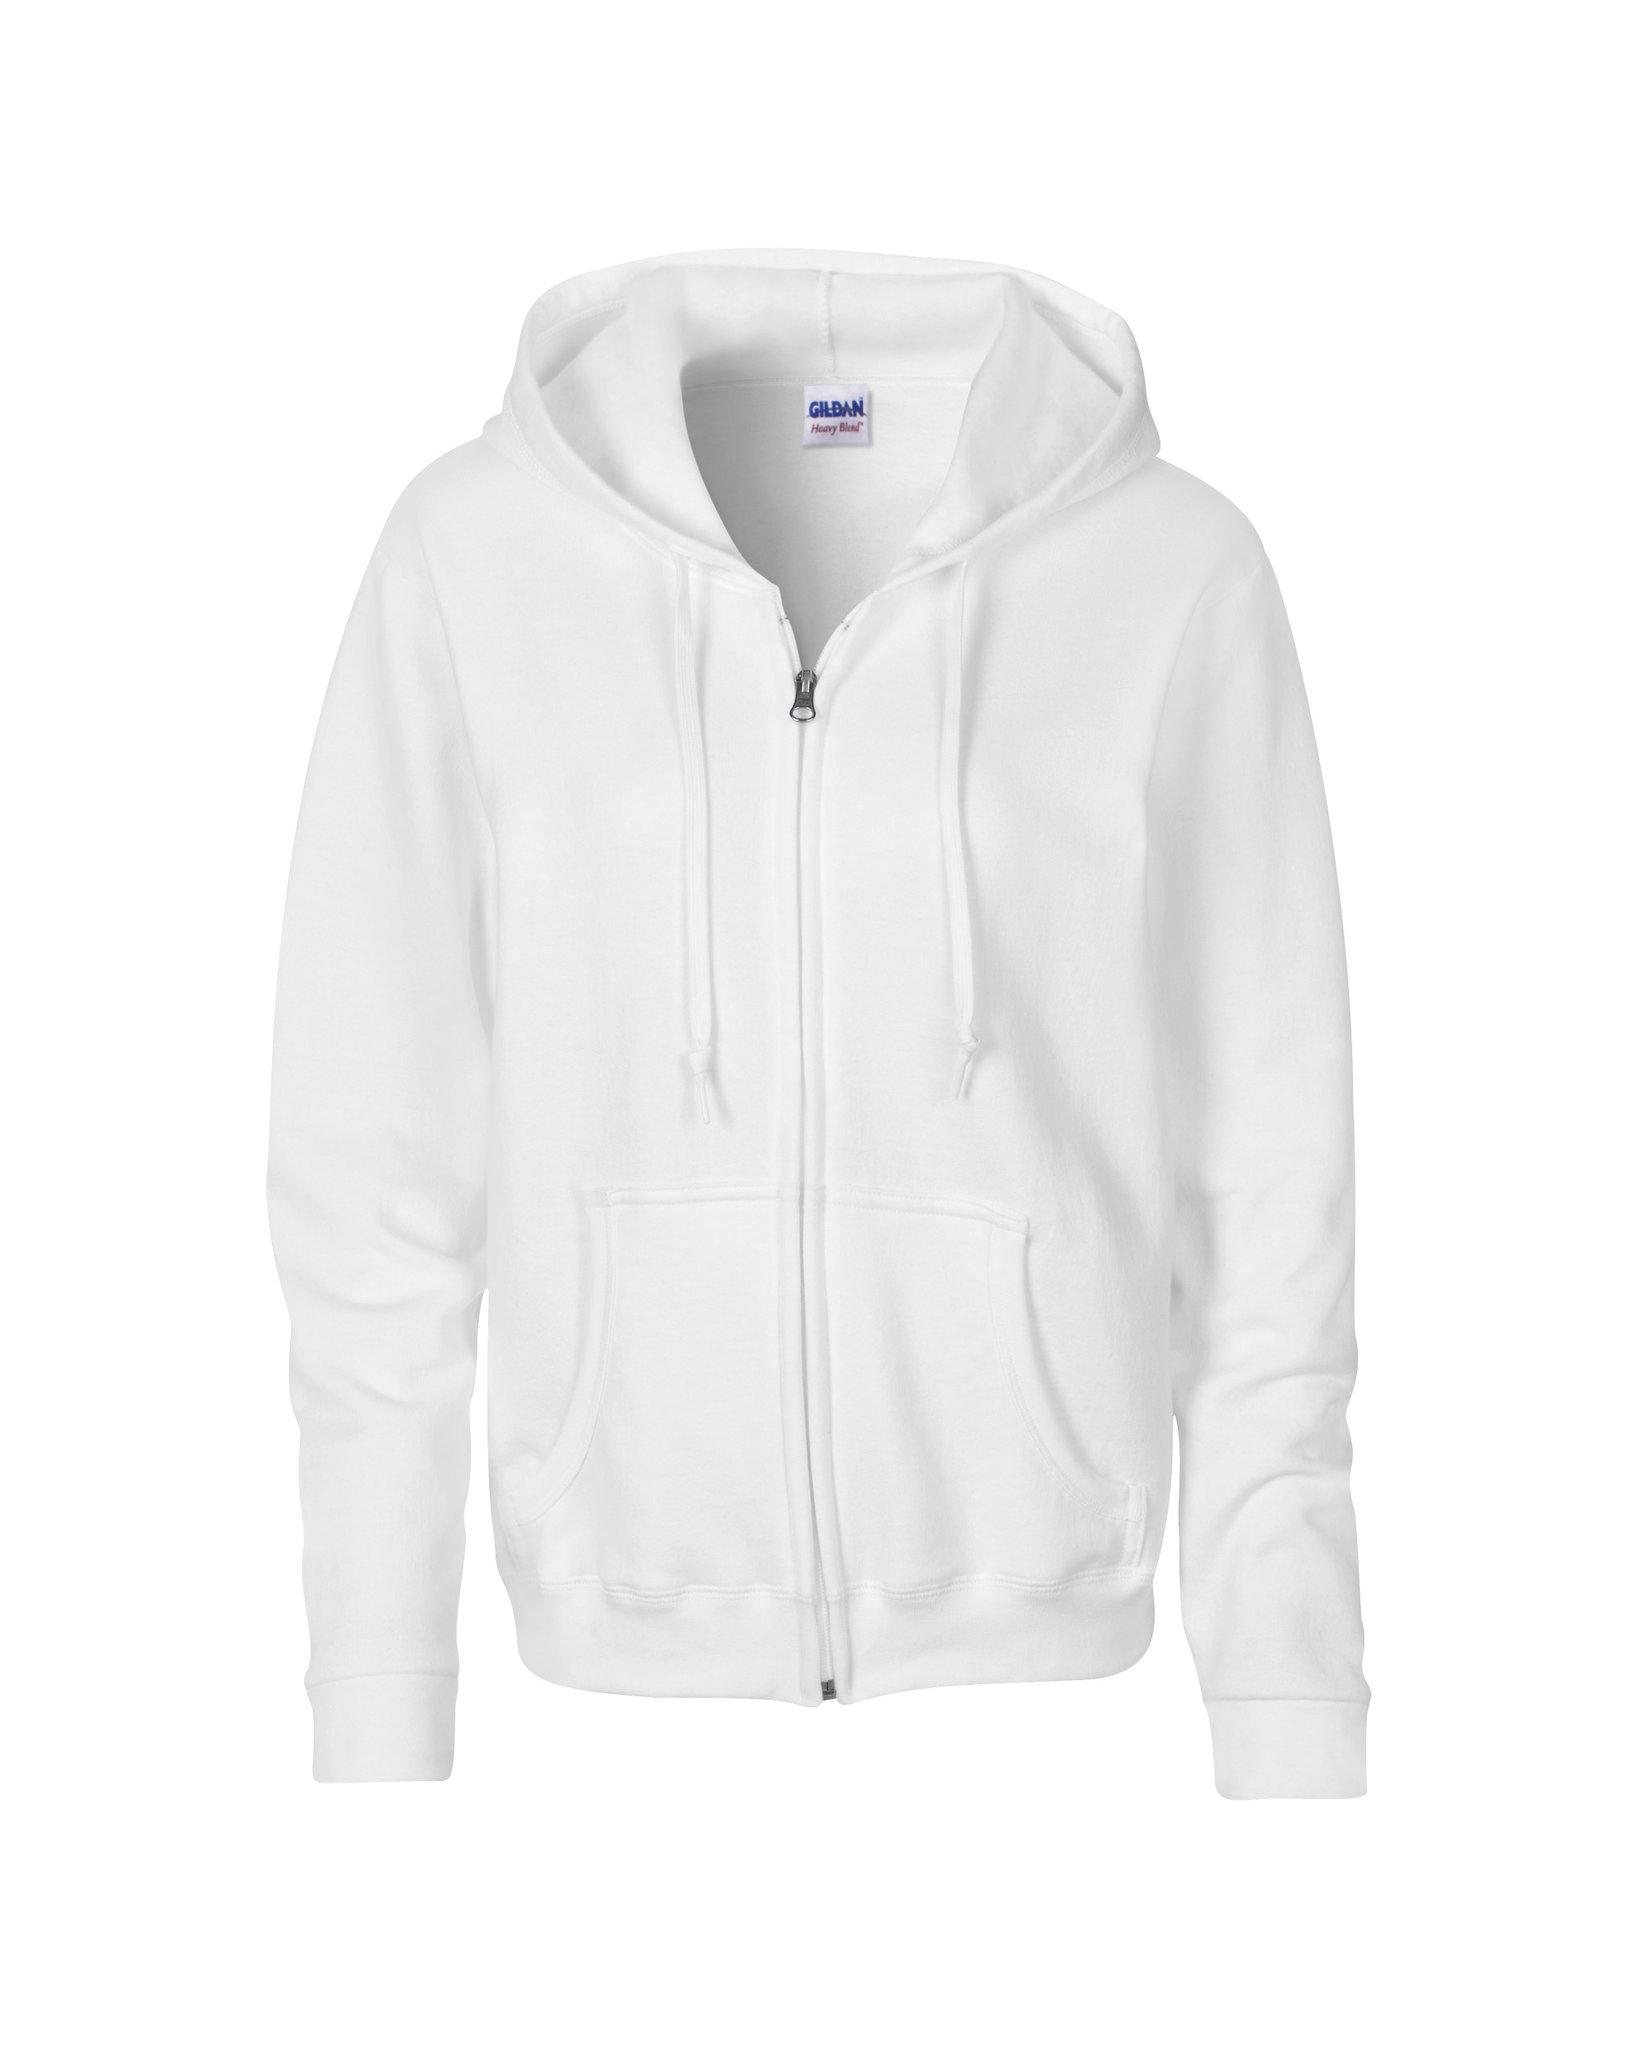 Sweatshirt promotionnel Heavy blendy navy - sweatshirt publicitaire